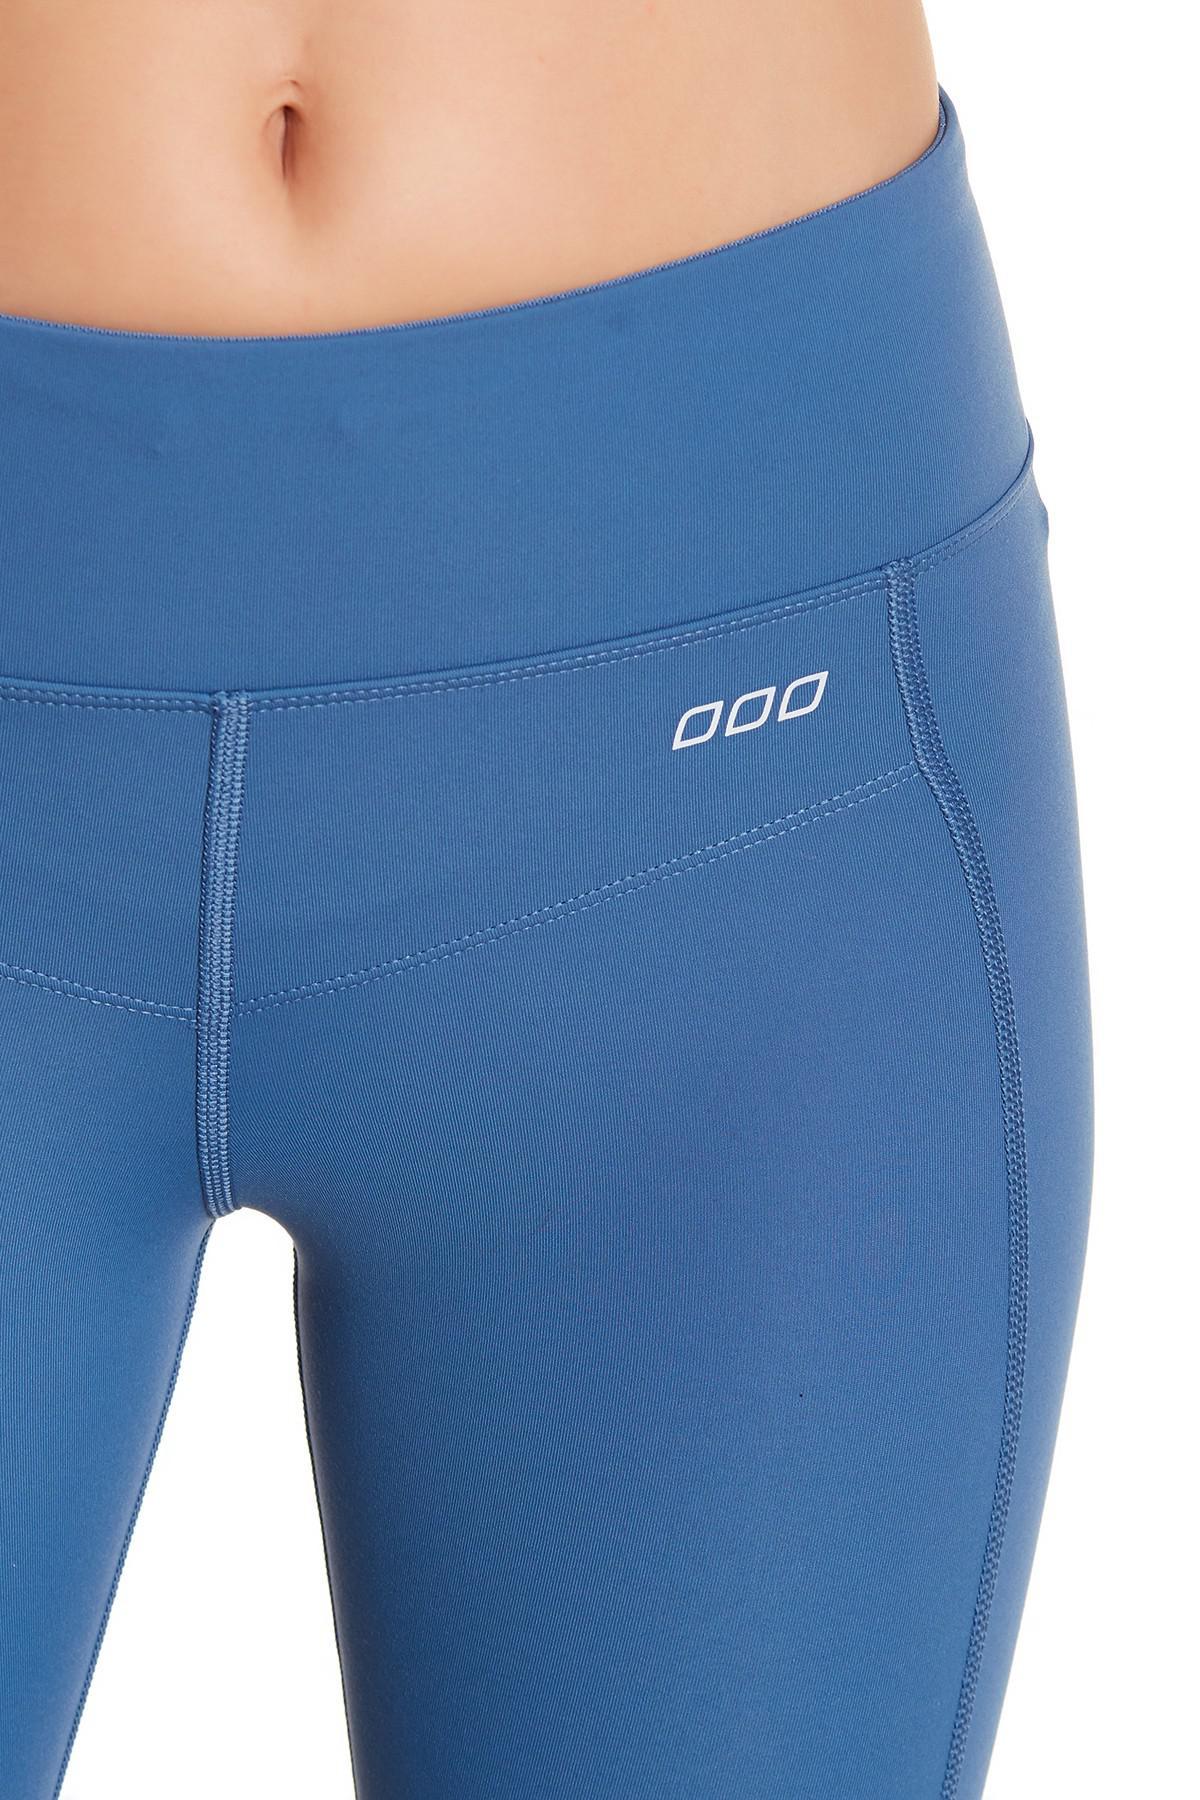 9389cc71ead9d Lorna Jane Booty Support Cropped Leggings in Blue - Lyst